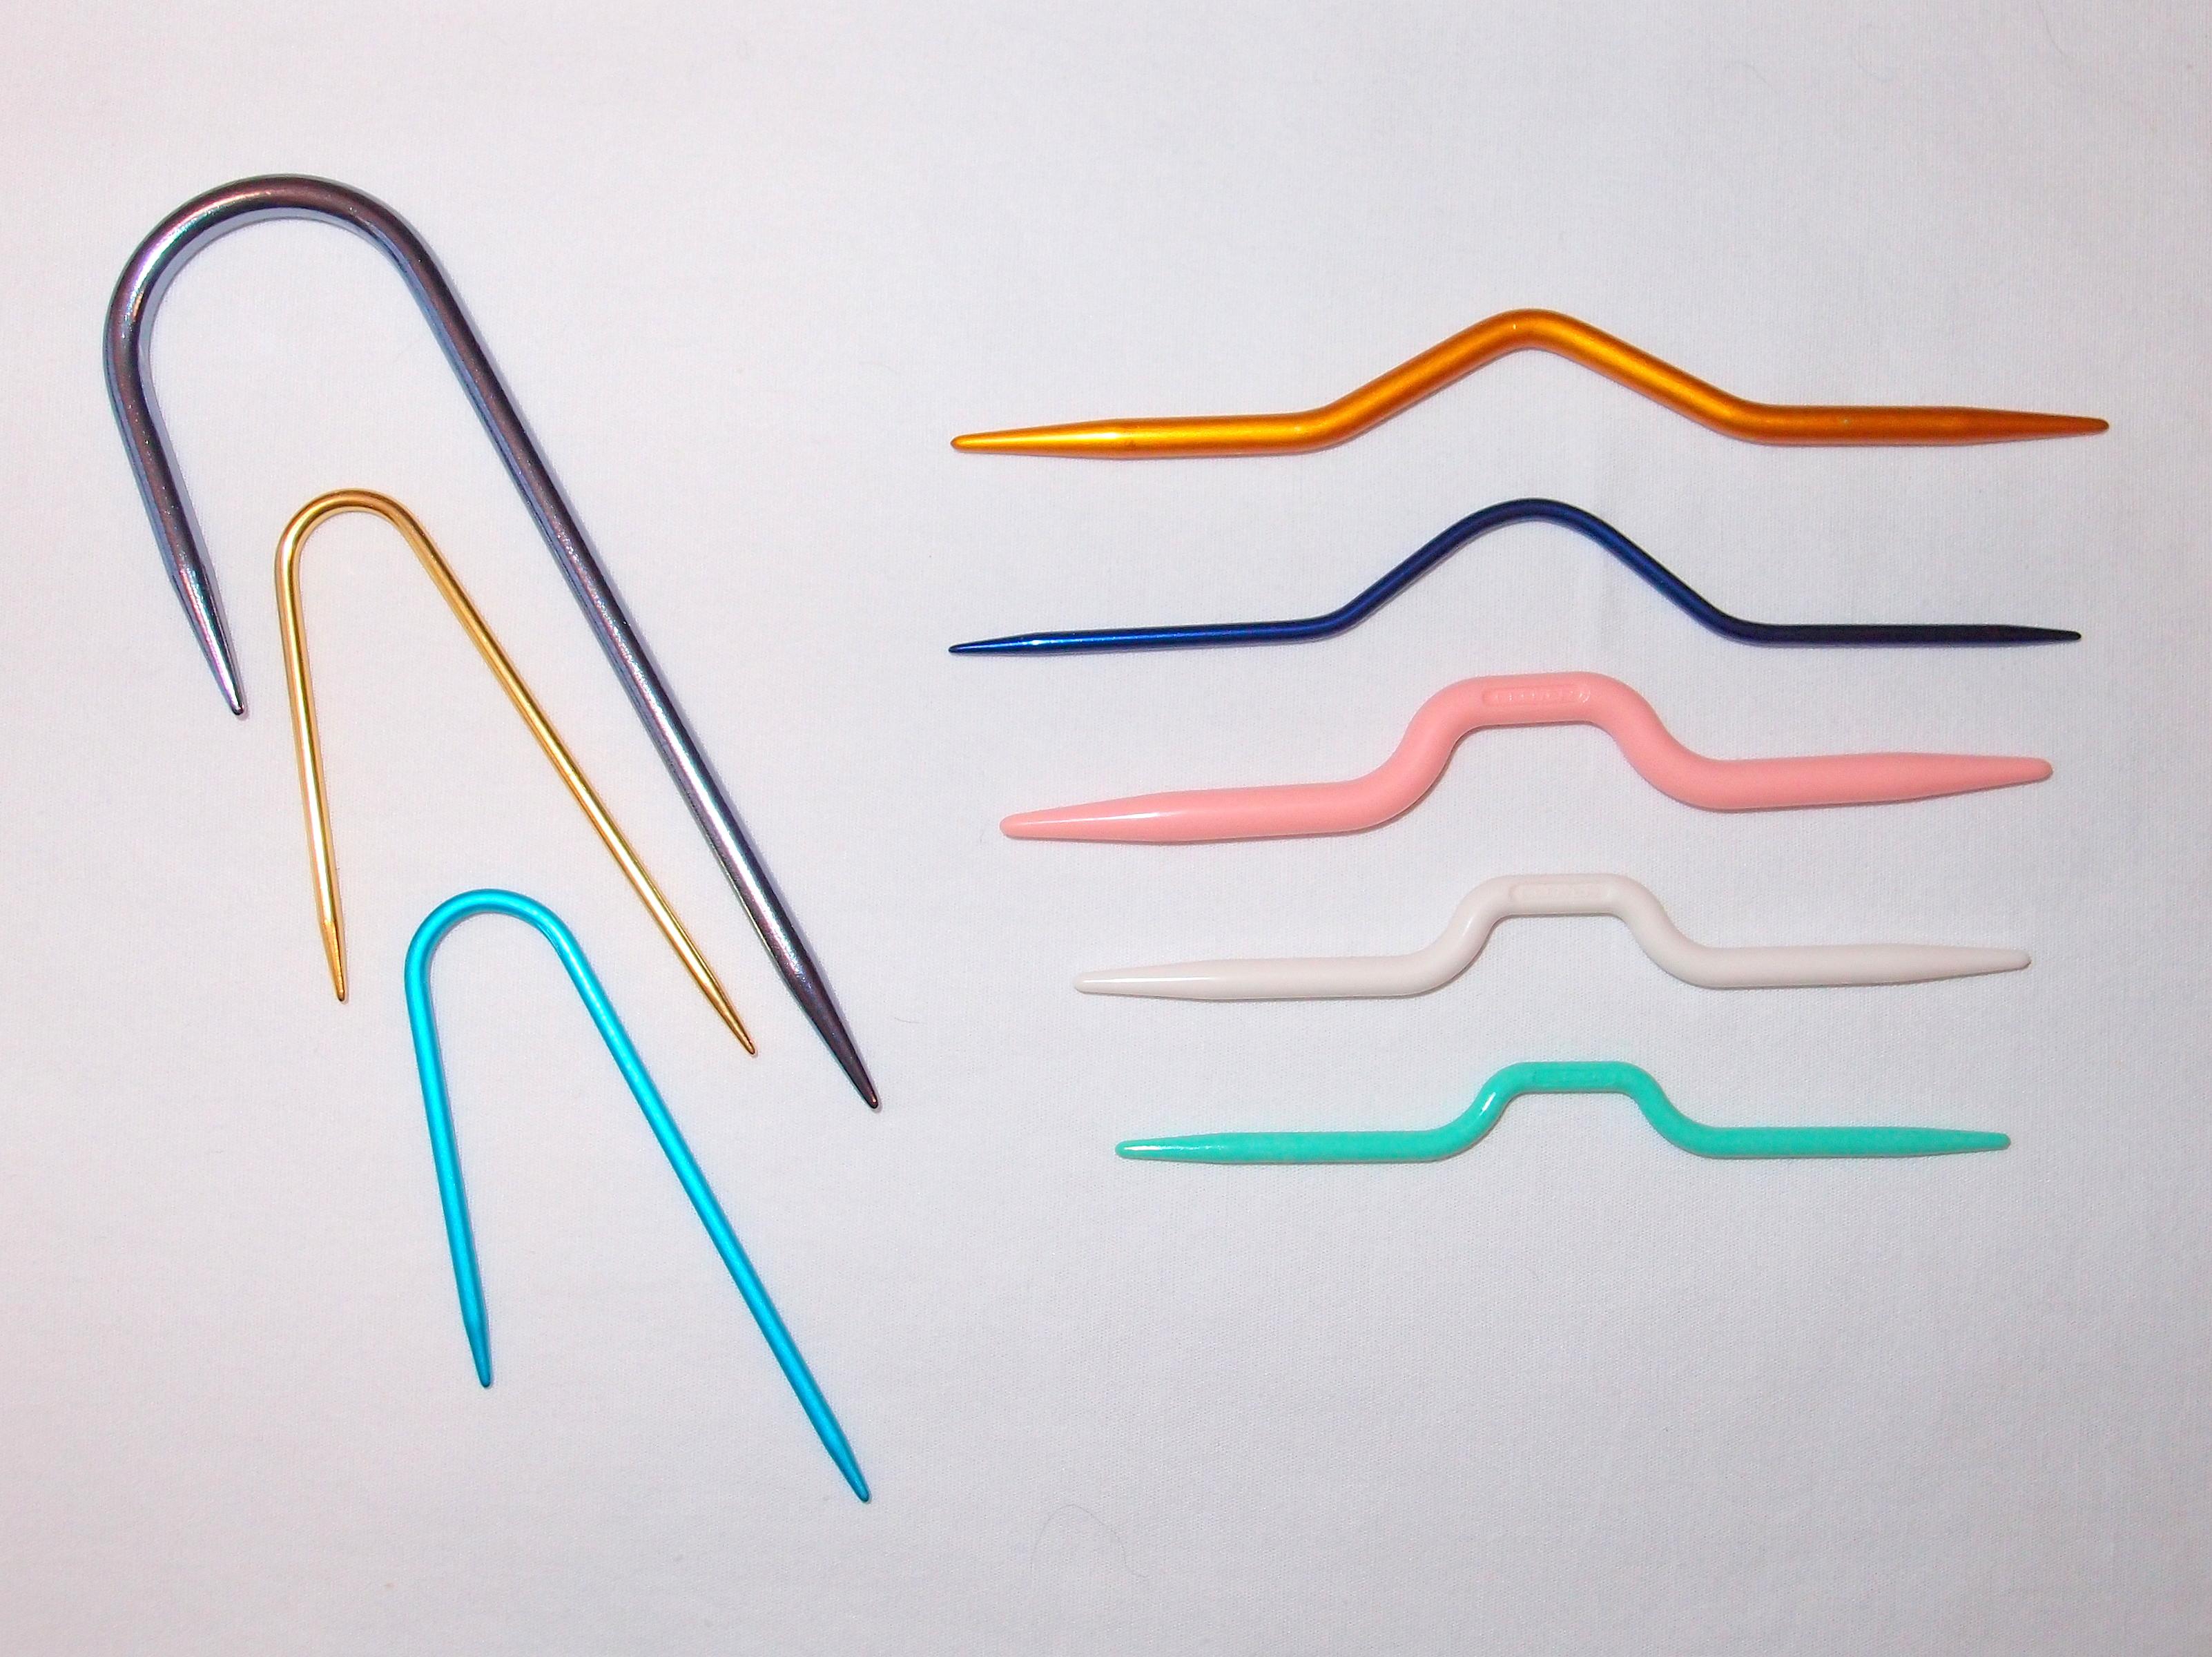 Rope Knitting Needles : Knitting basic knit stitch continental method